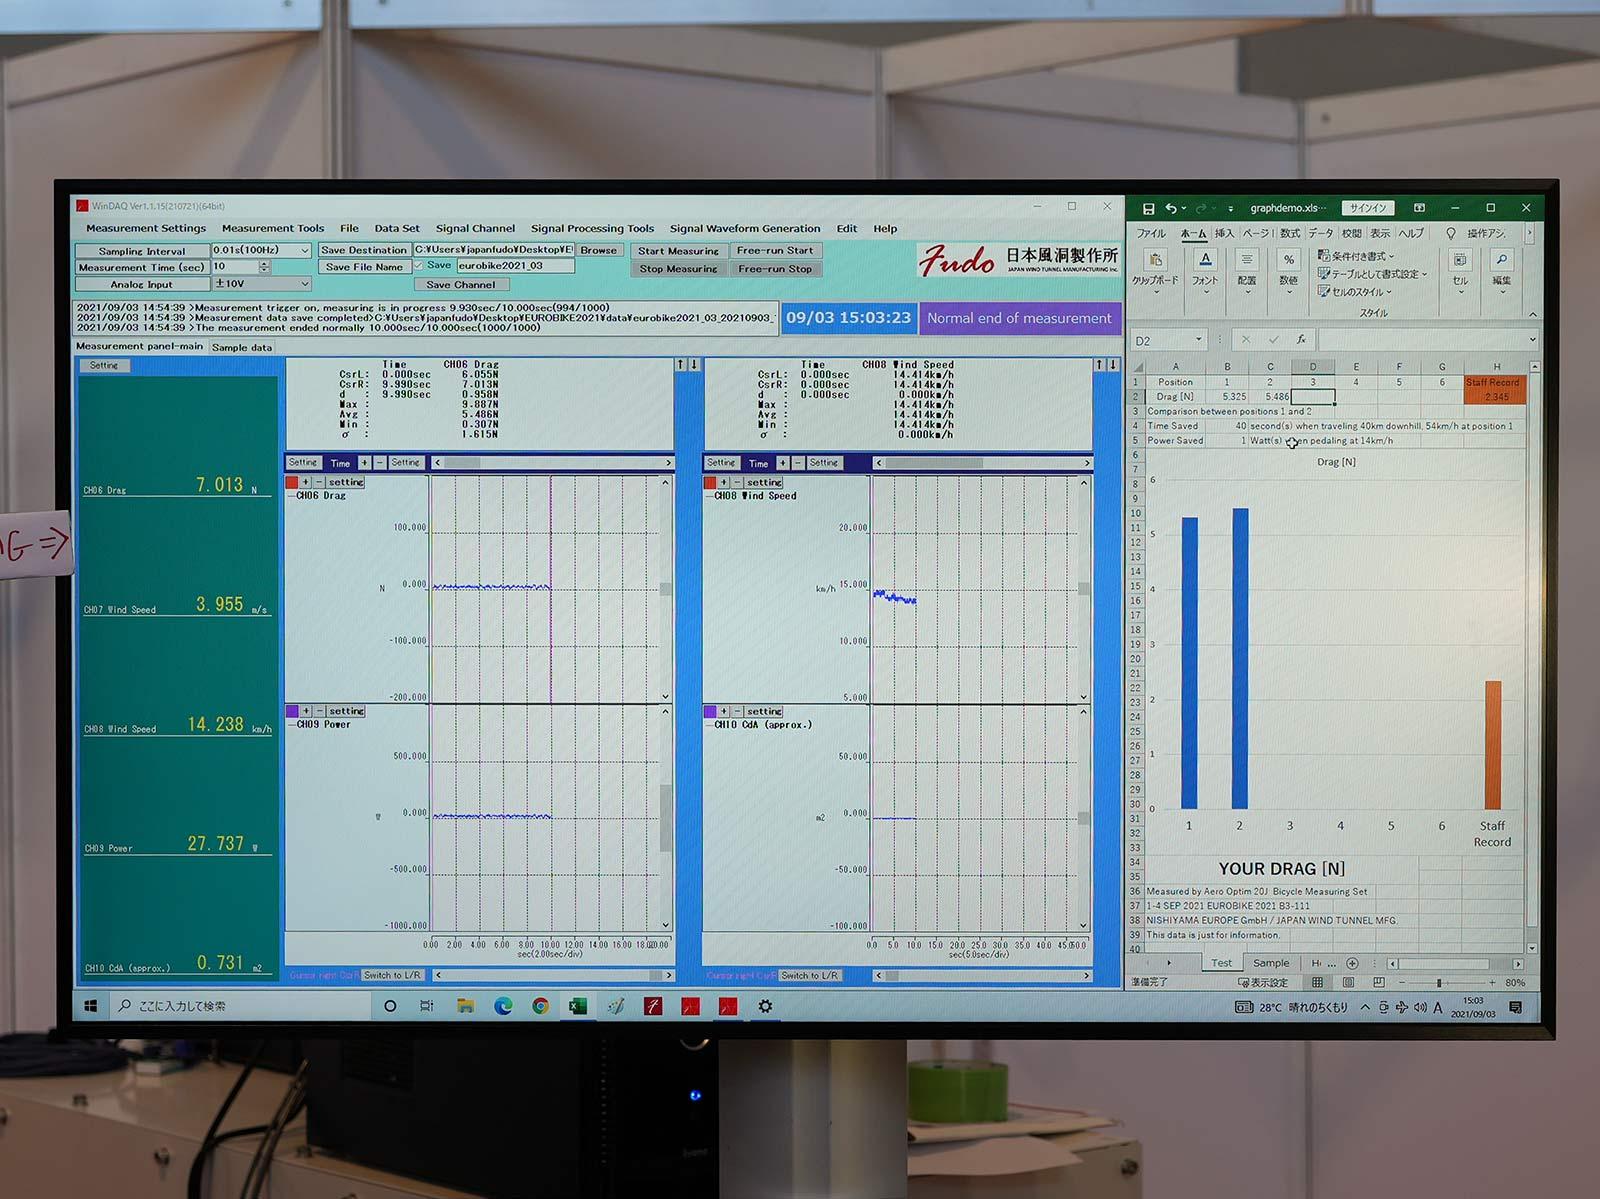 aero drag data shown on a computer screen